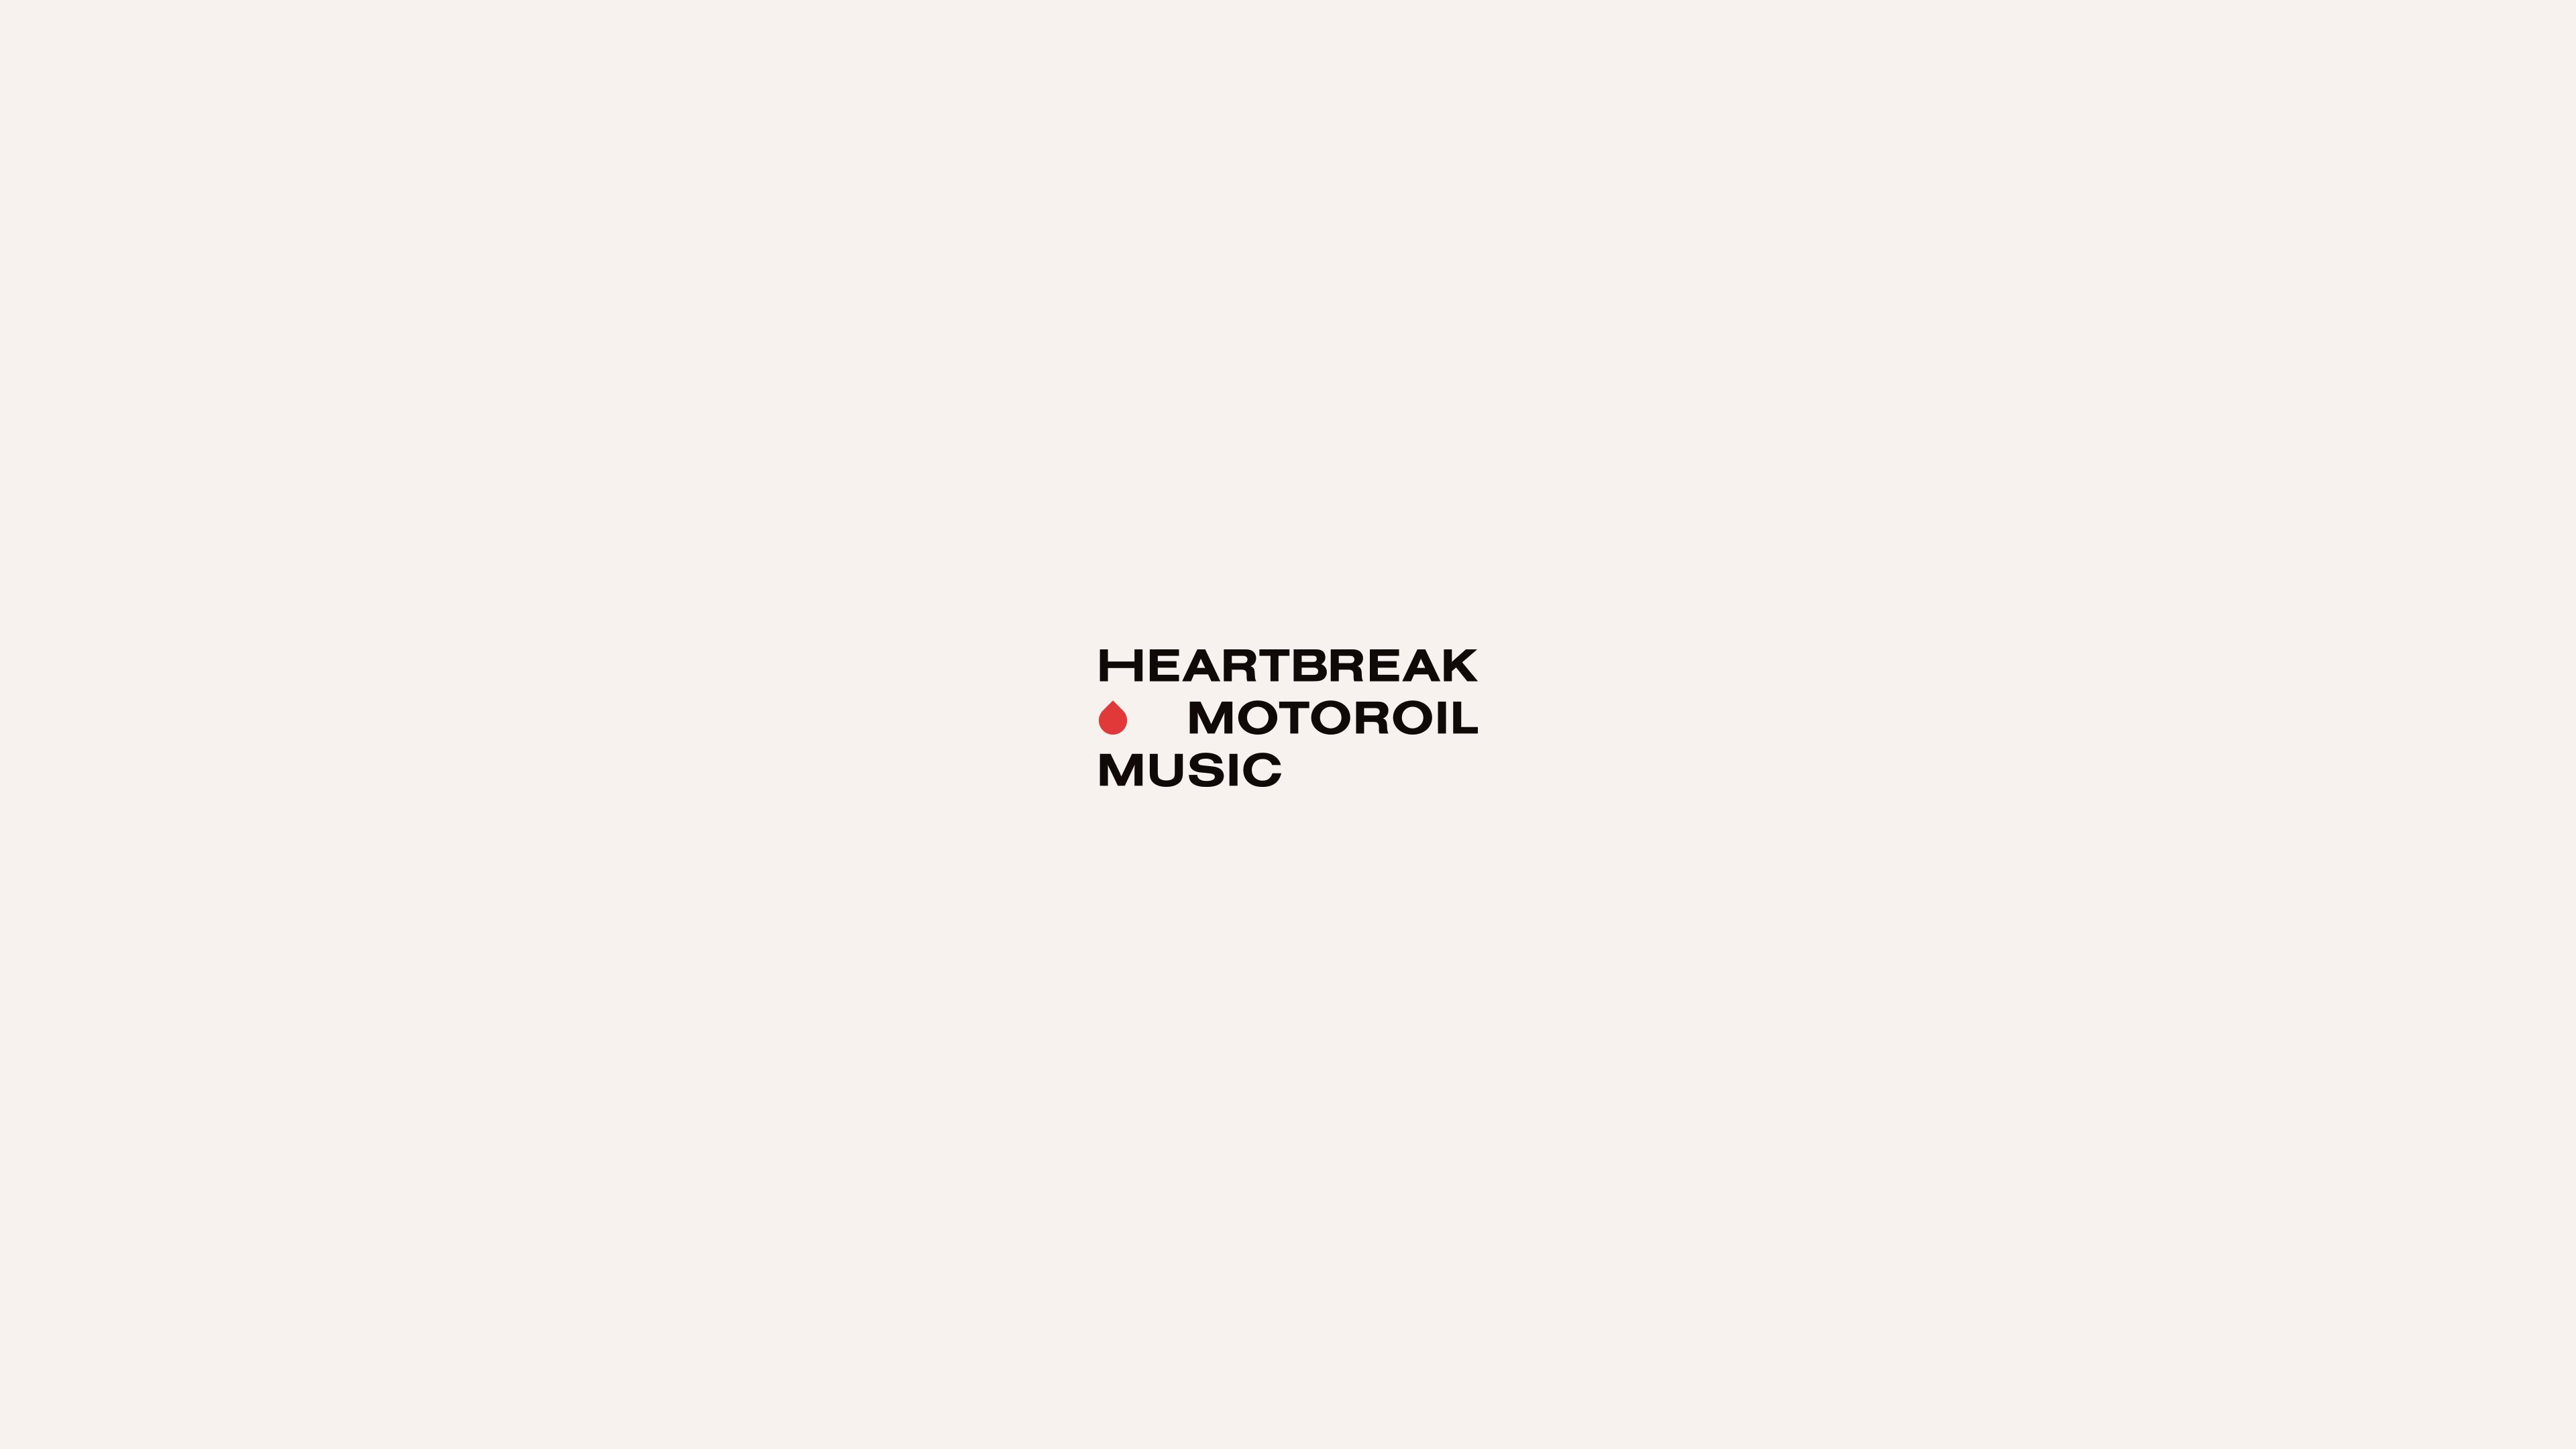 Heartbreak Motoroil Music logo